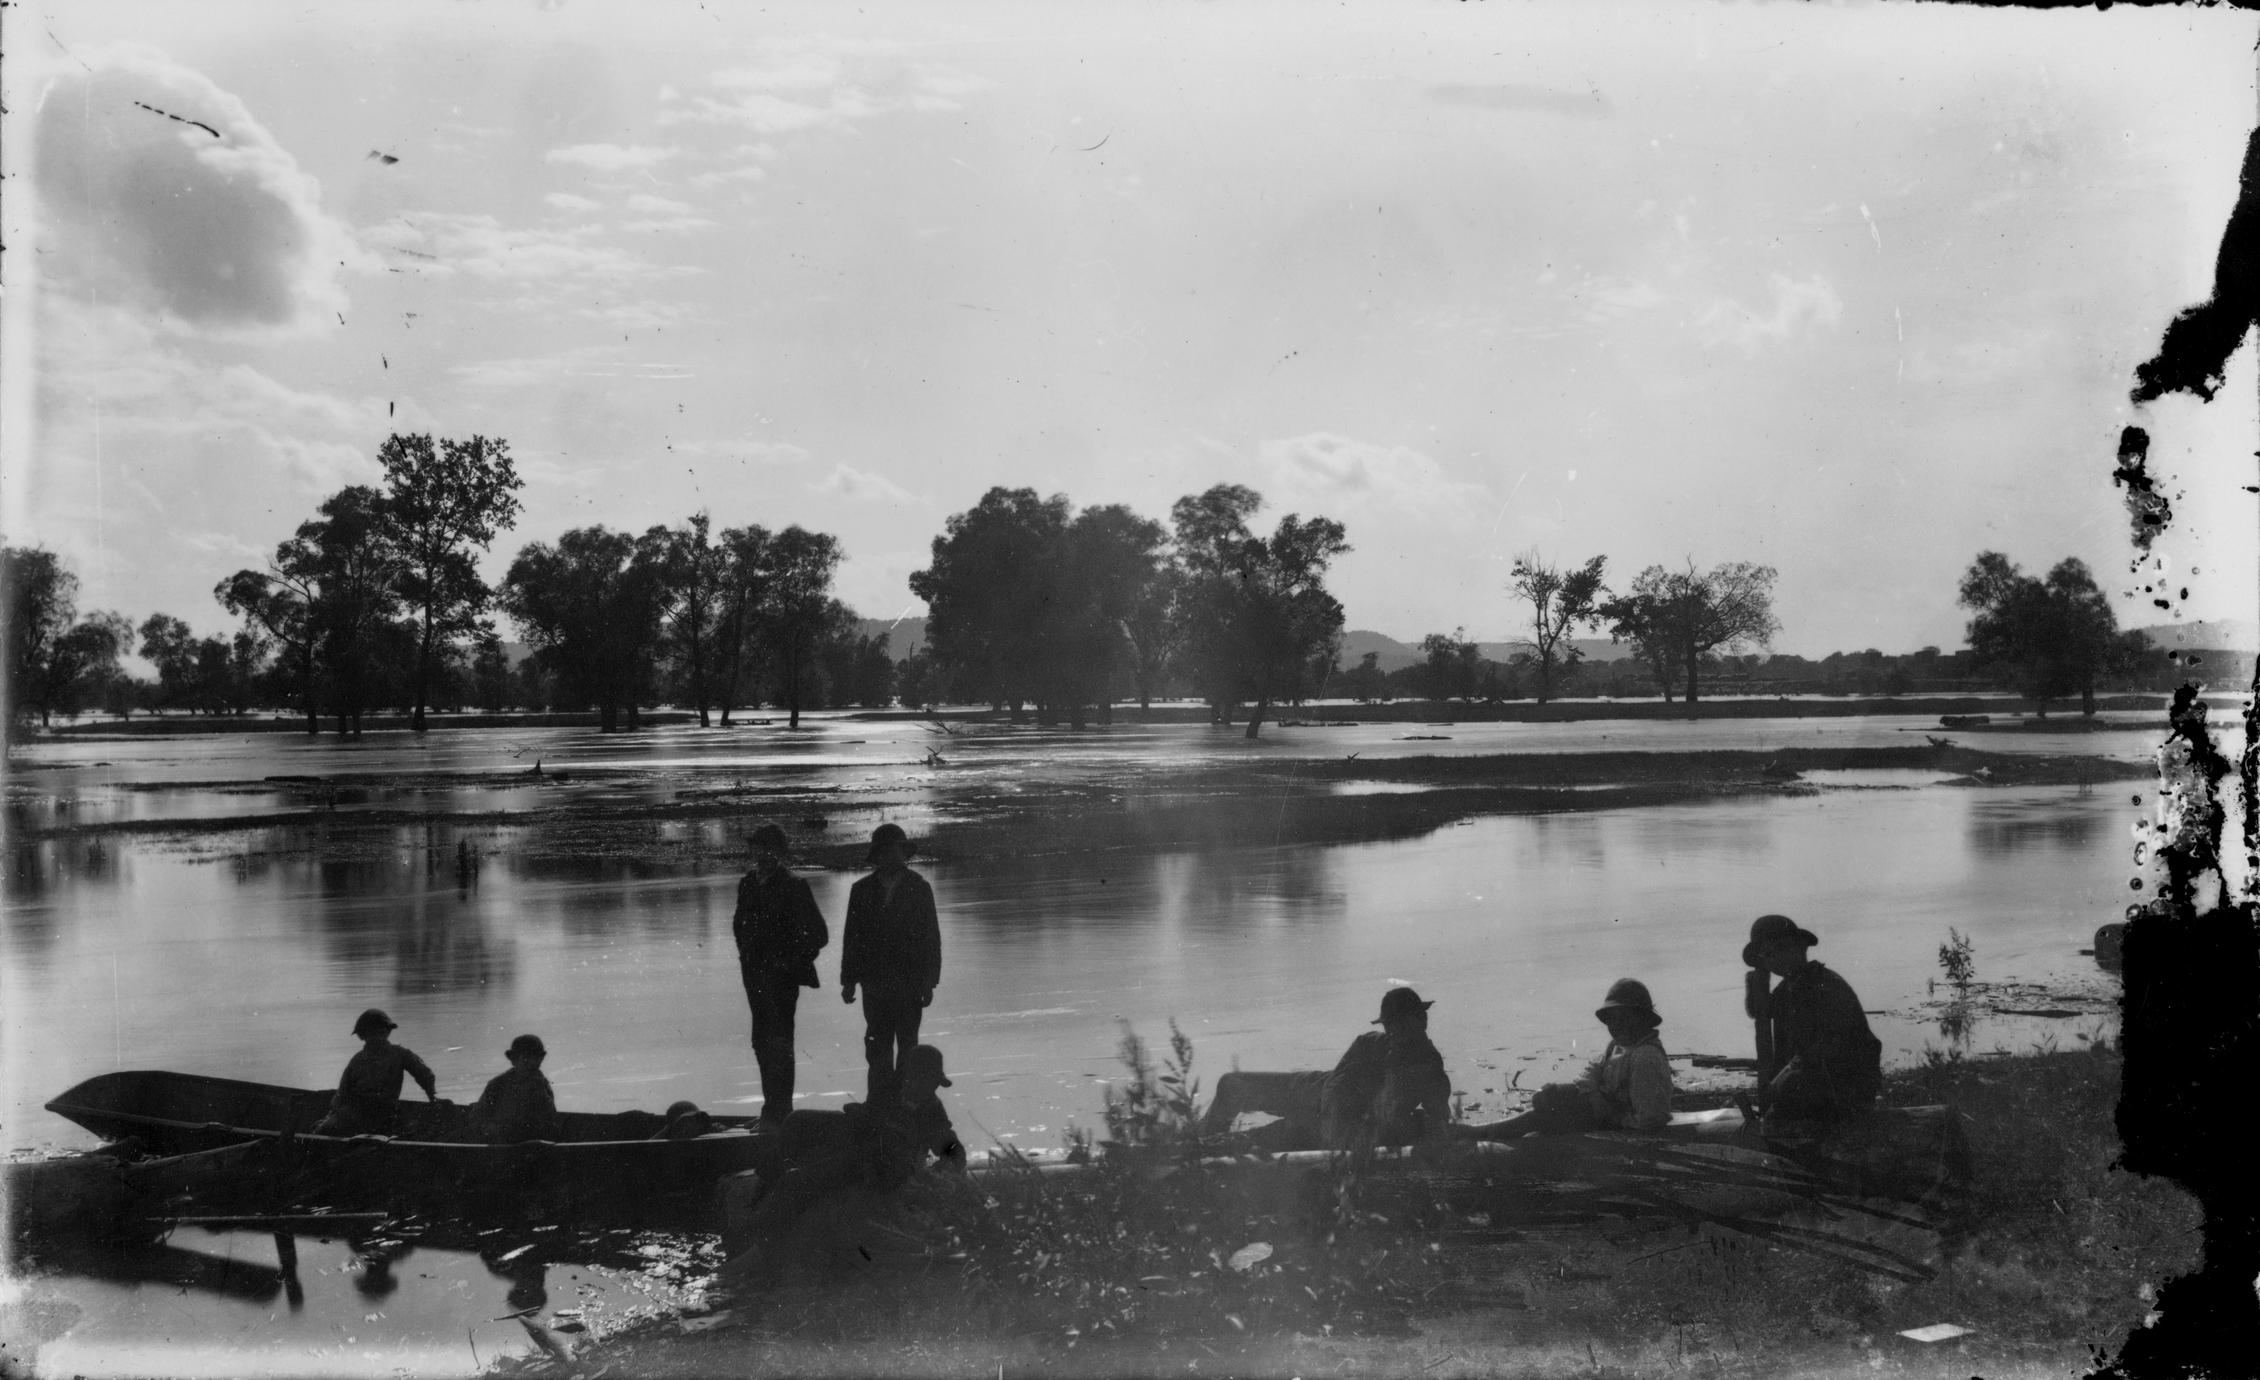 Mississippi River (Rivers)